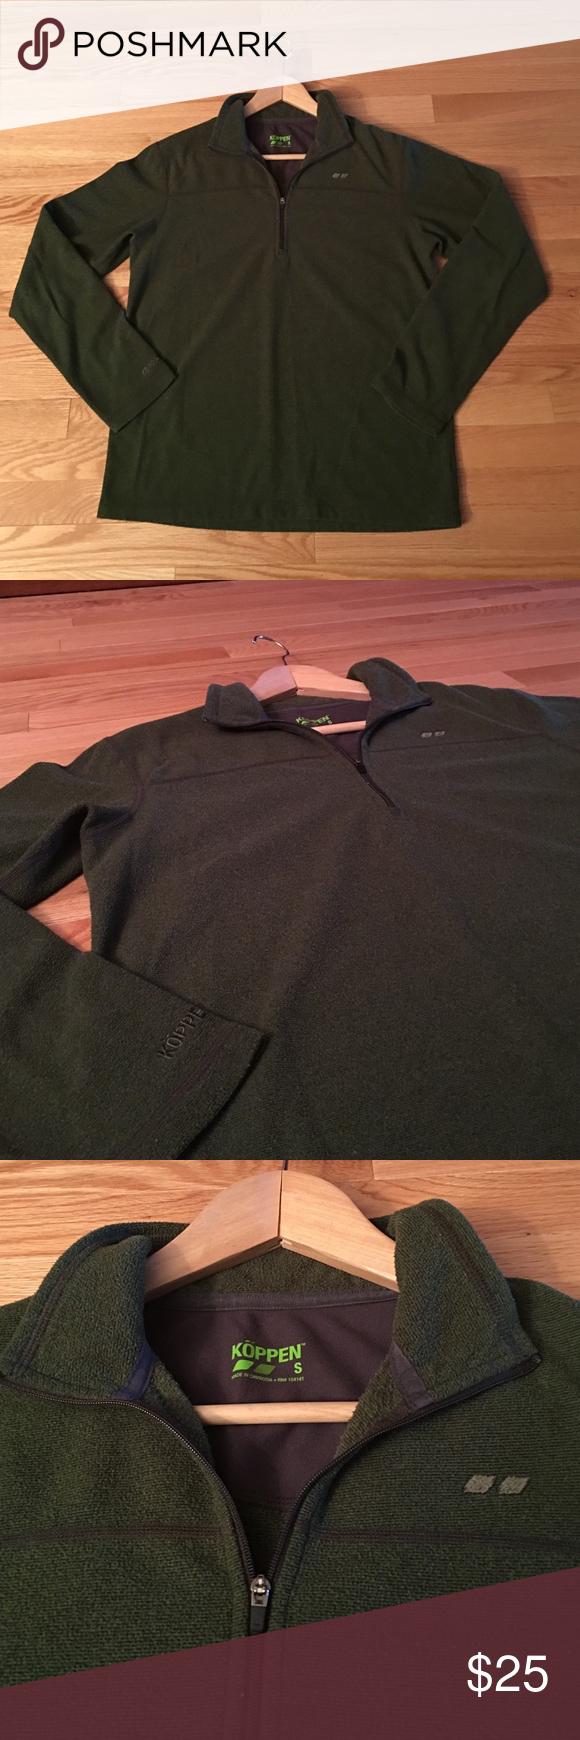 Köppen Light Weight Pullover Hunter green knit/fleece like material quarter zip pullover. Good condition. 100% Polyester. Köppen Shirts Sweatshirts & Hoodies